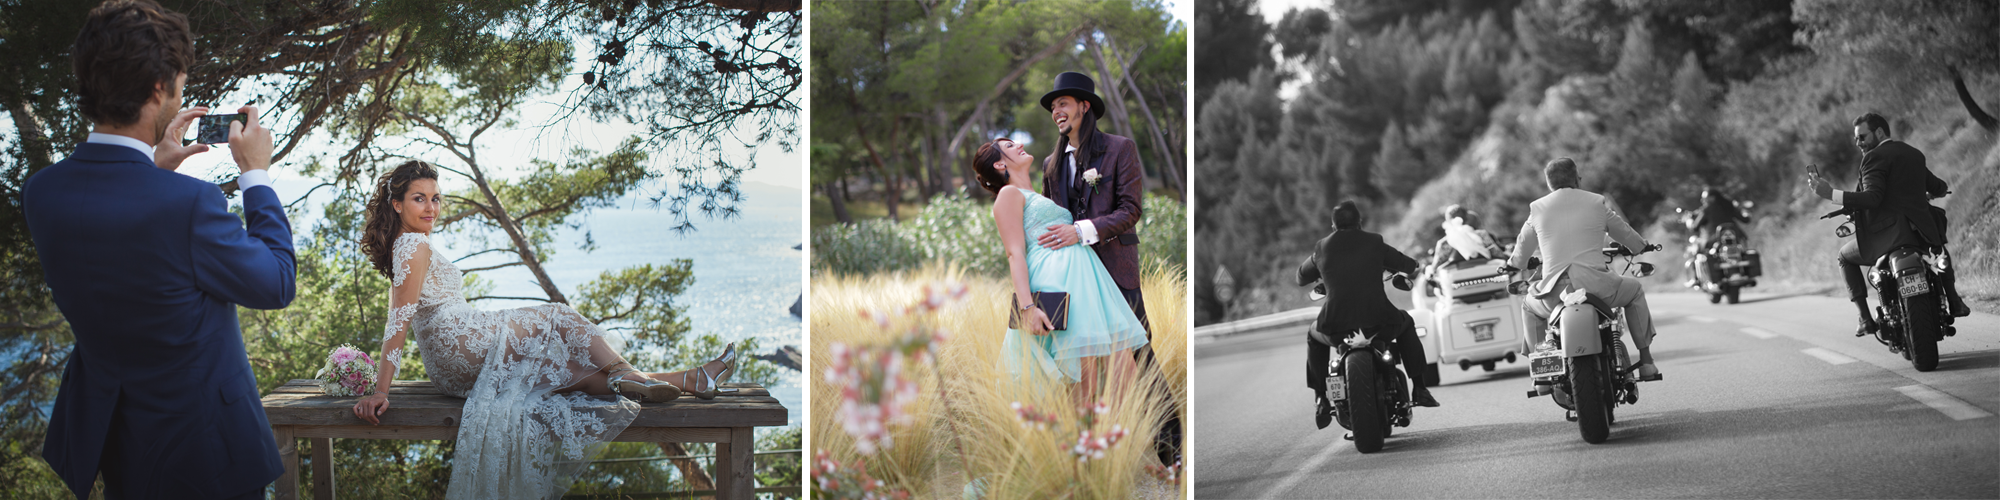 studio-colas-photographe_film-mariage